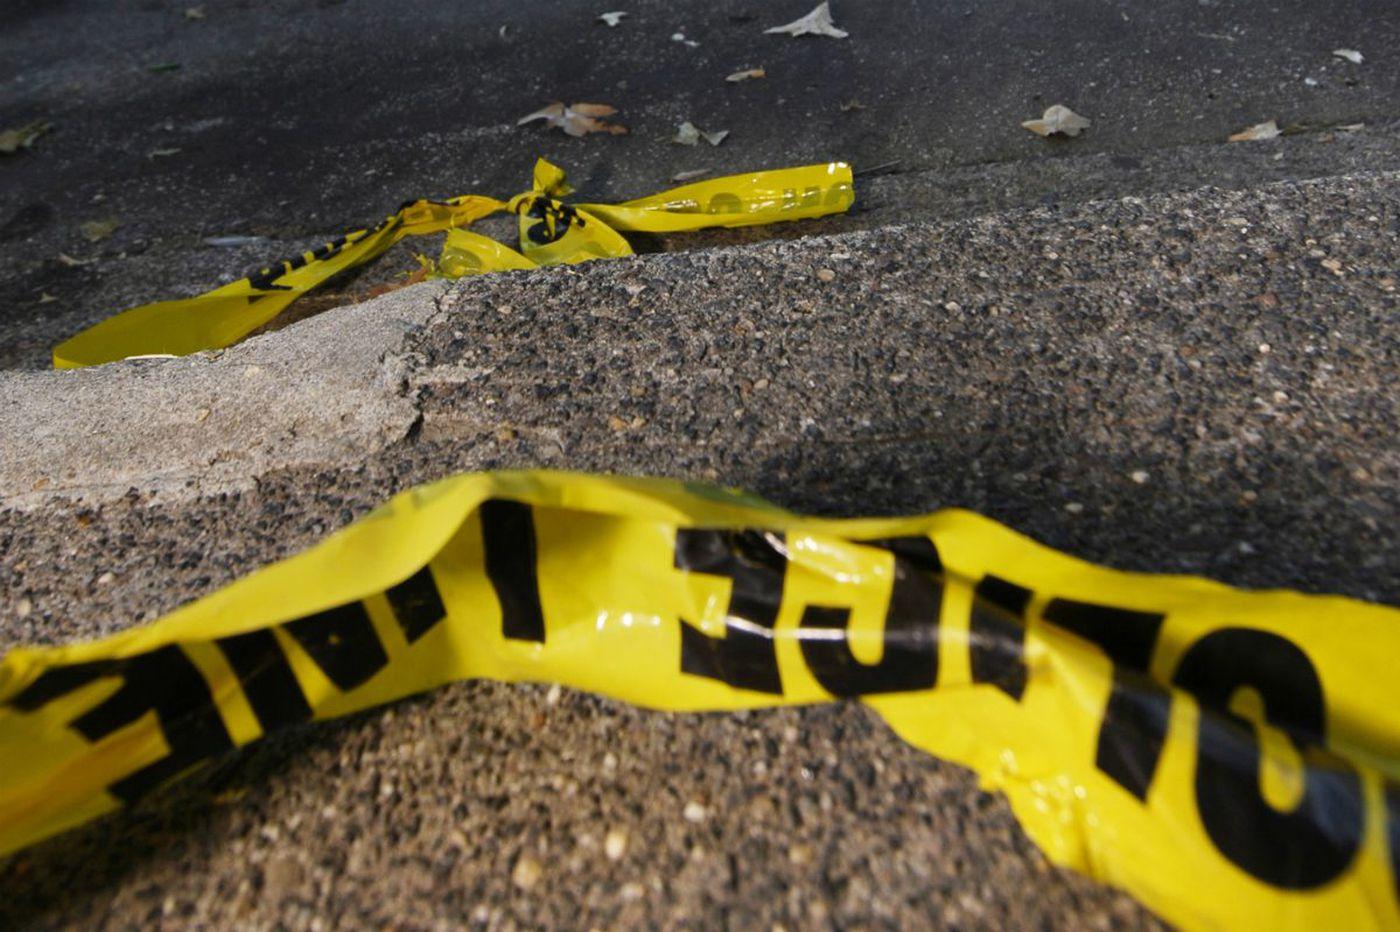 Art student found slain in Cobbs Creek